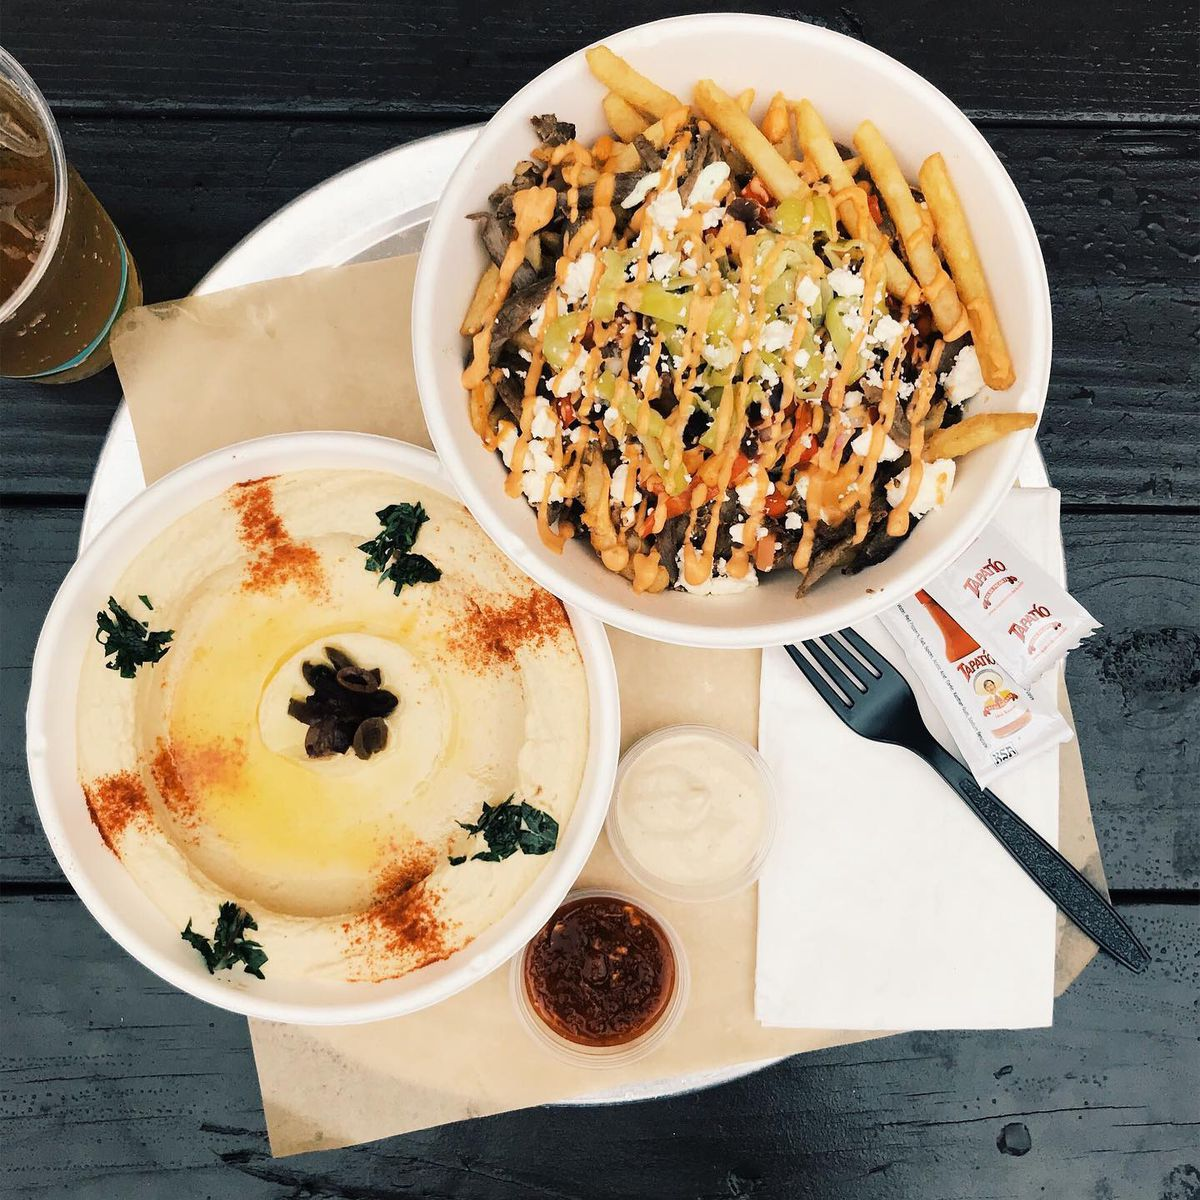 Hummus and fries from Tahini